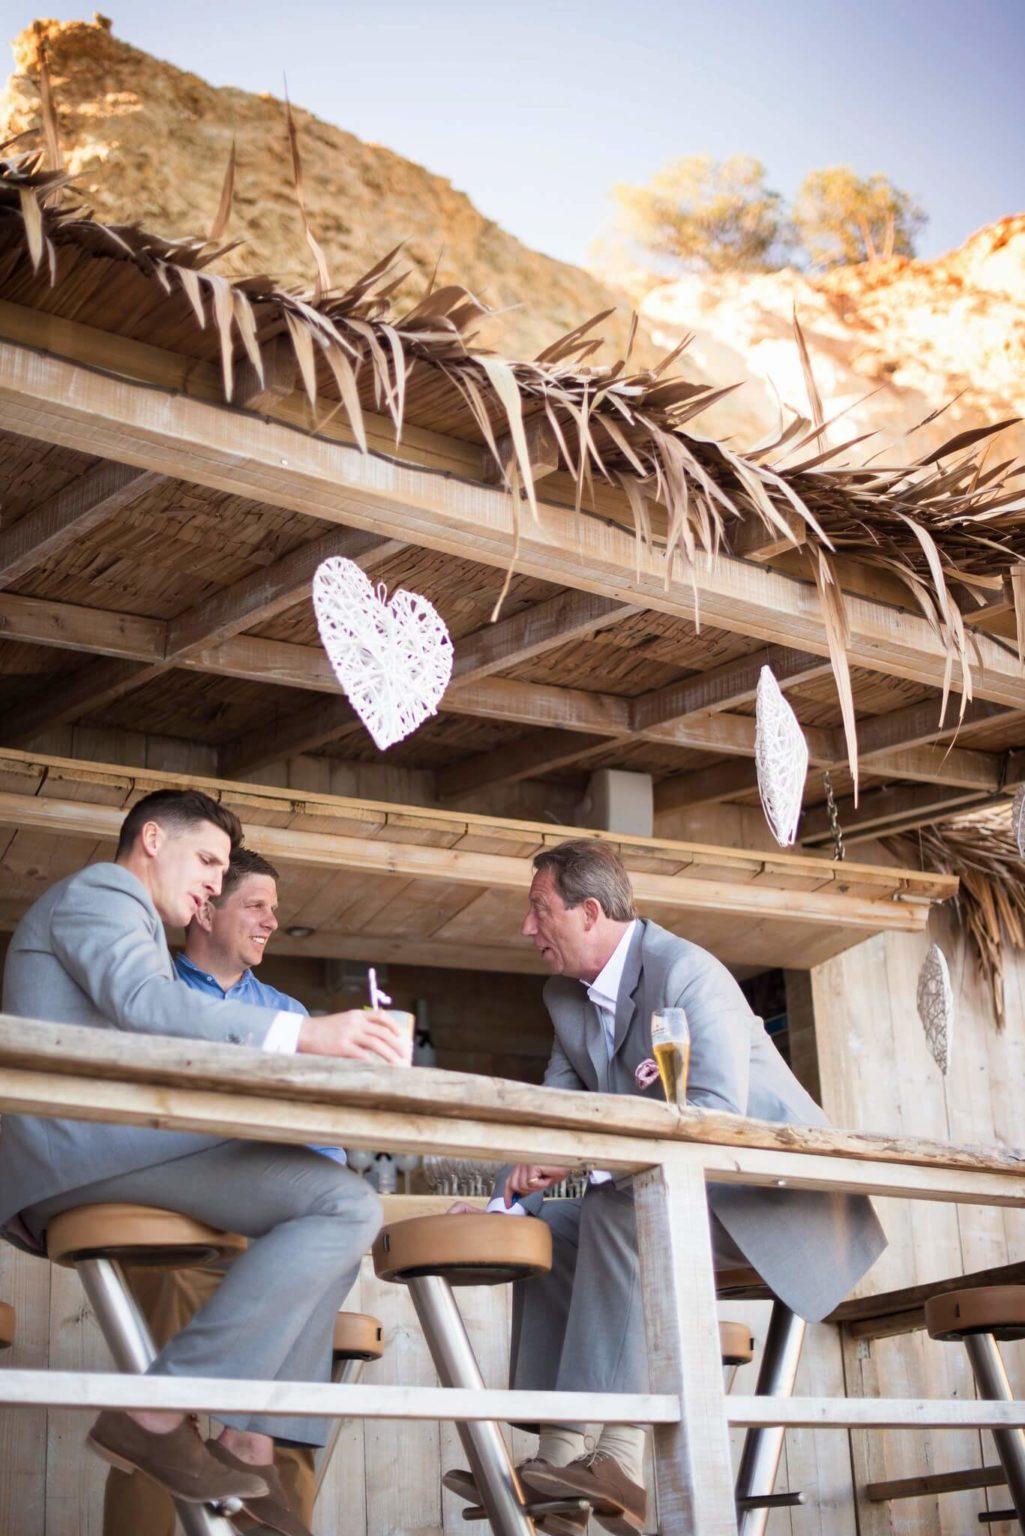 https://www.white-ibiza.com/wp-content/uploads/2020/03/ibiza-wedding-venues-amante-ibiza-2020-00-1025x1536.jpg